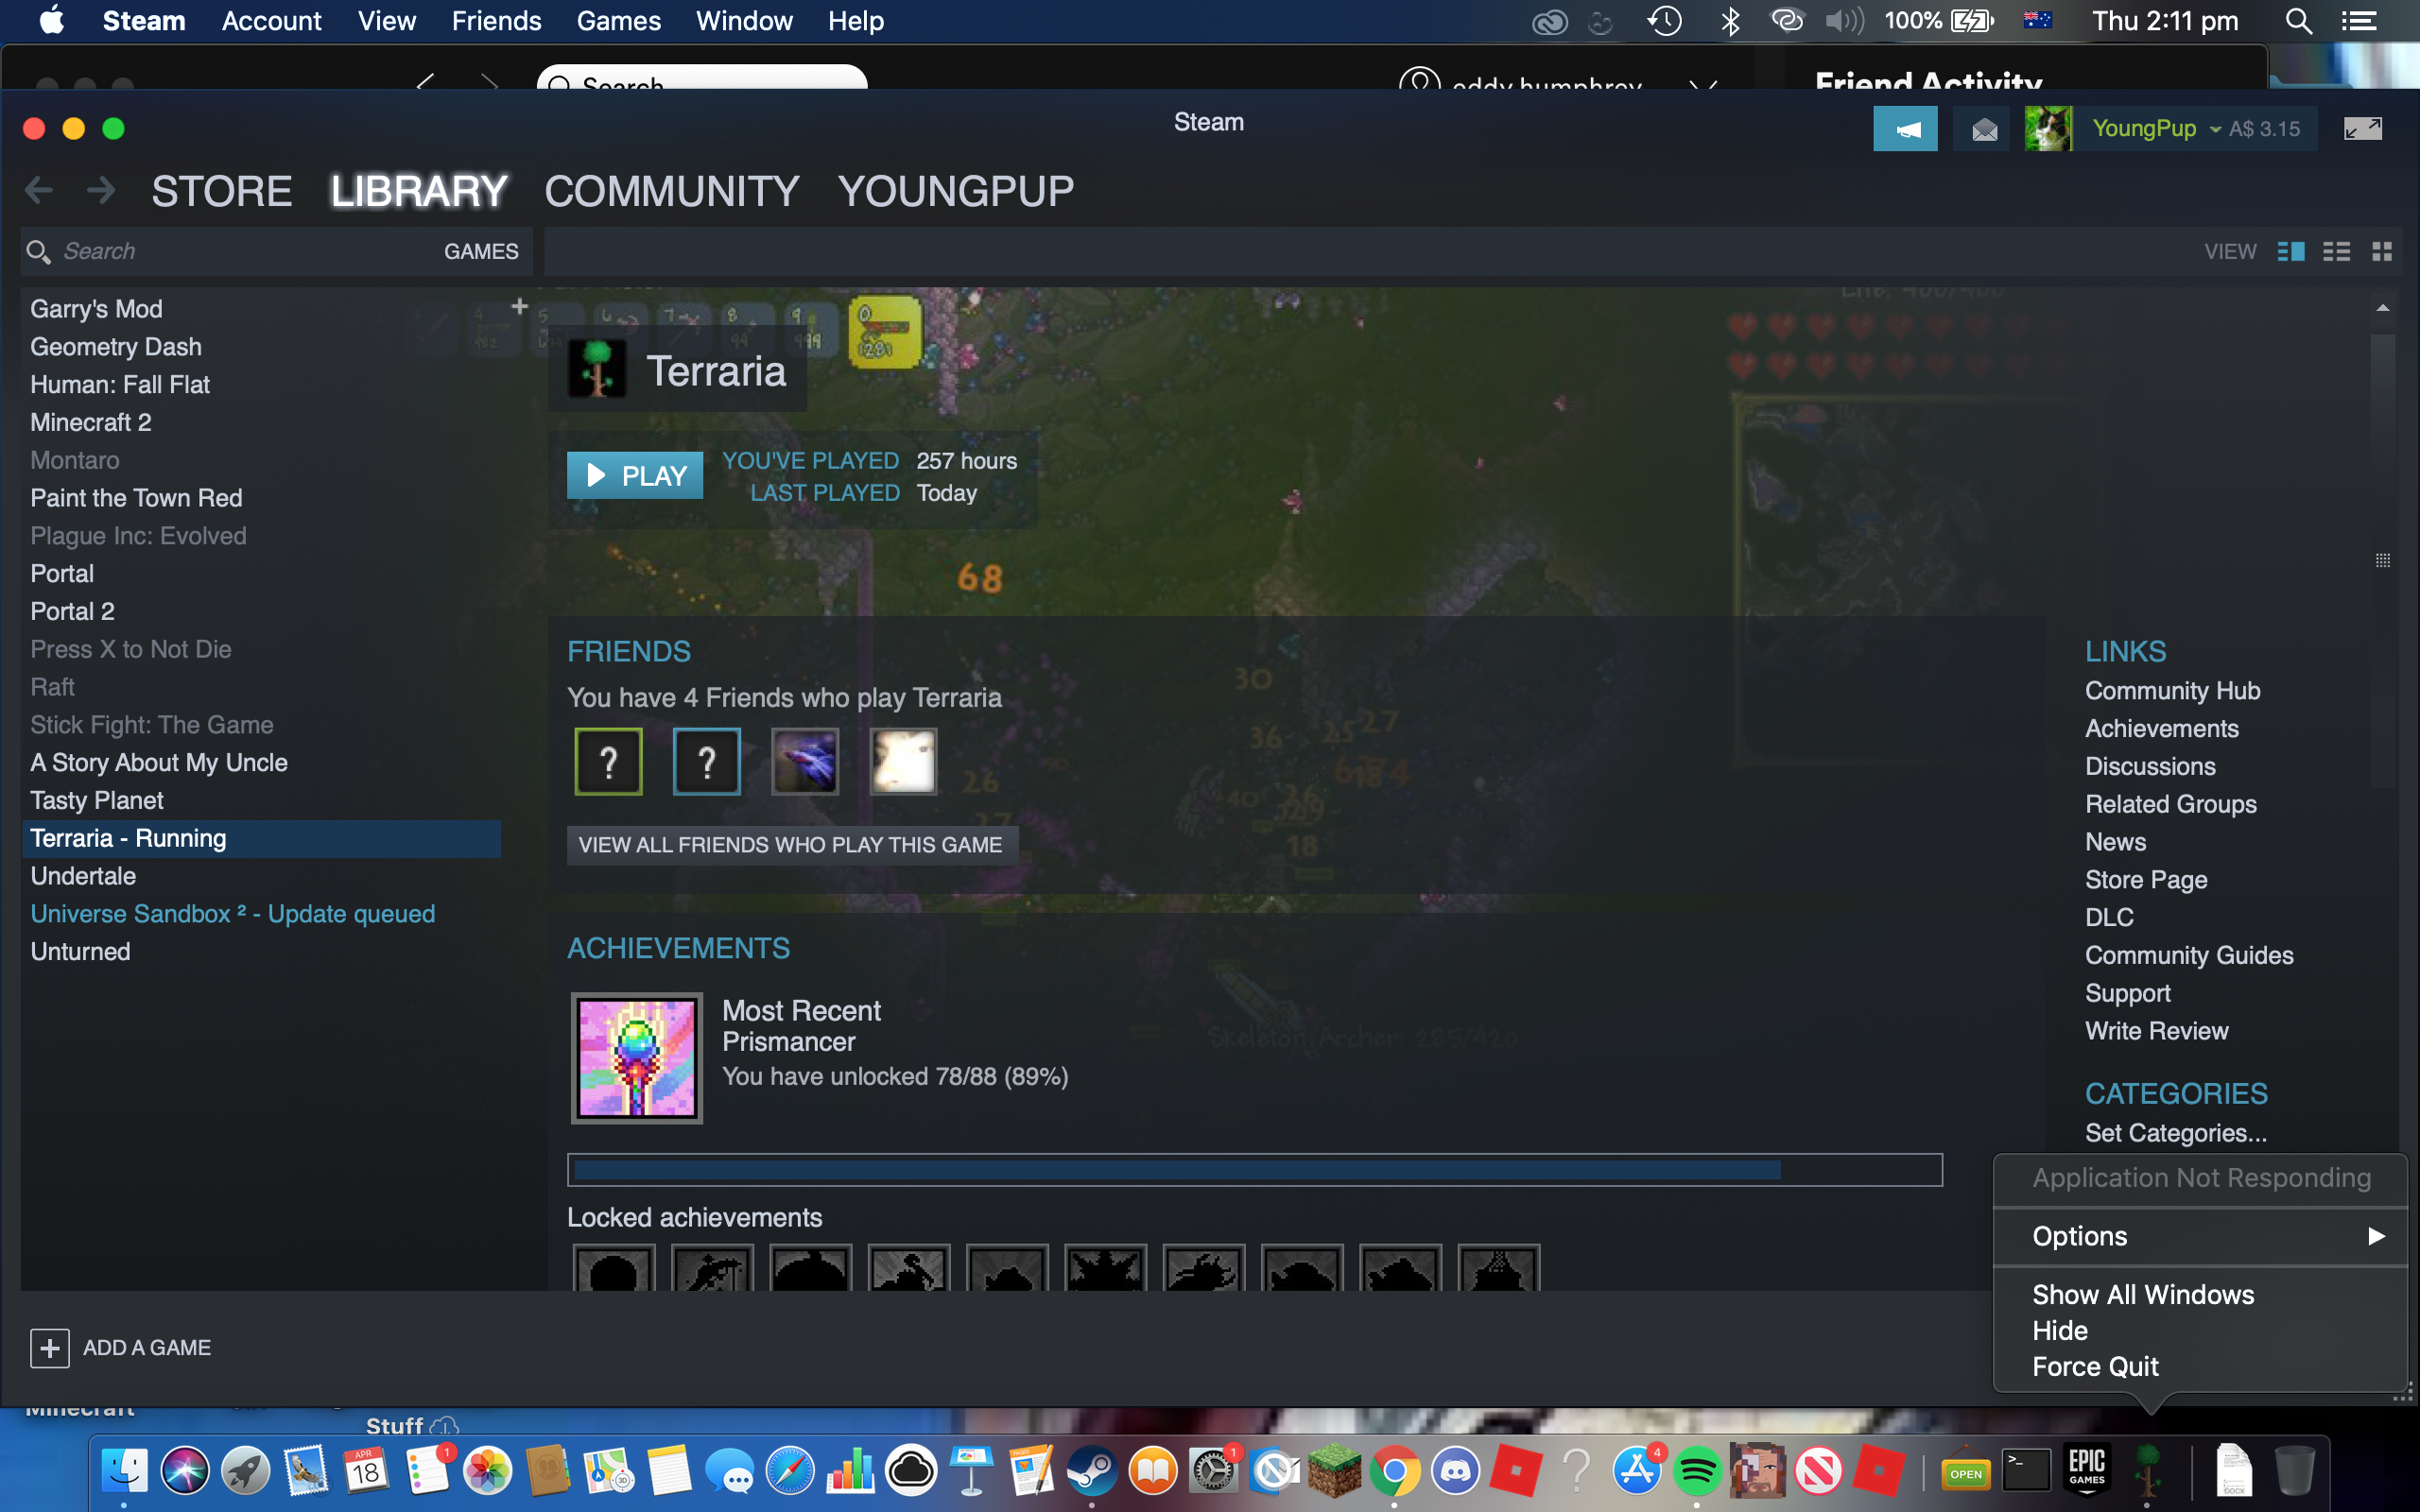 Mac - When I open Terraria on Steam, It'd say